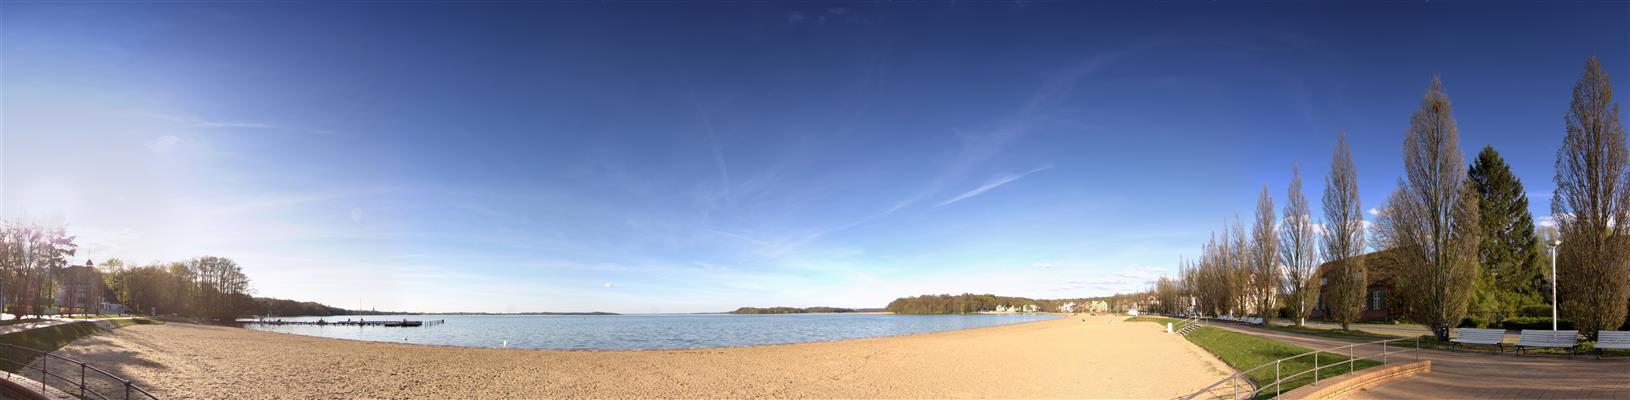 Schweriner See Zippendorfer Strand